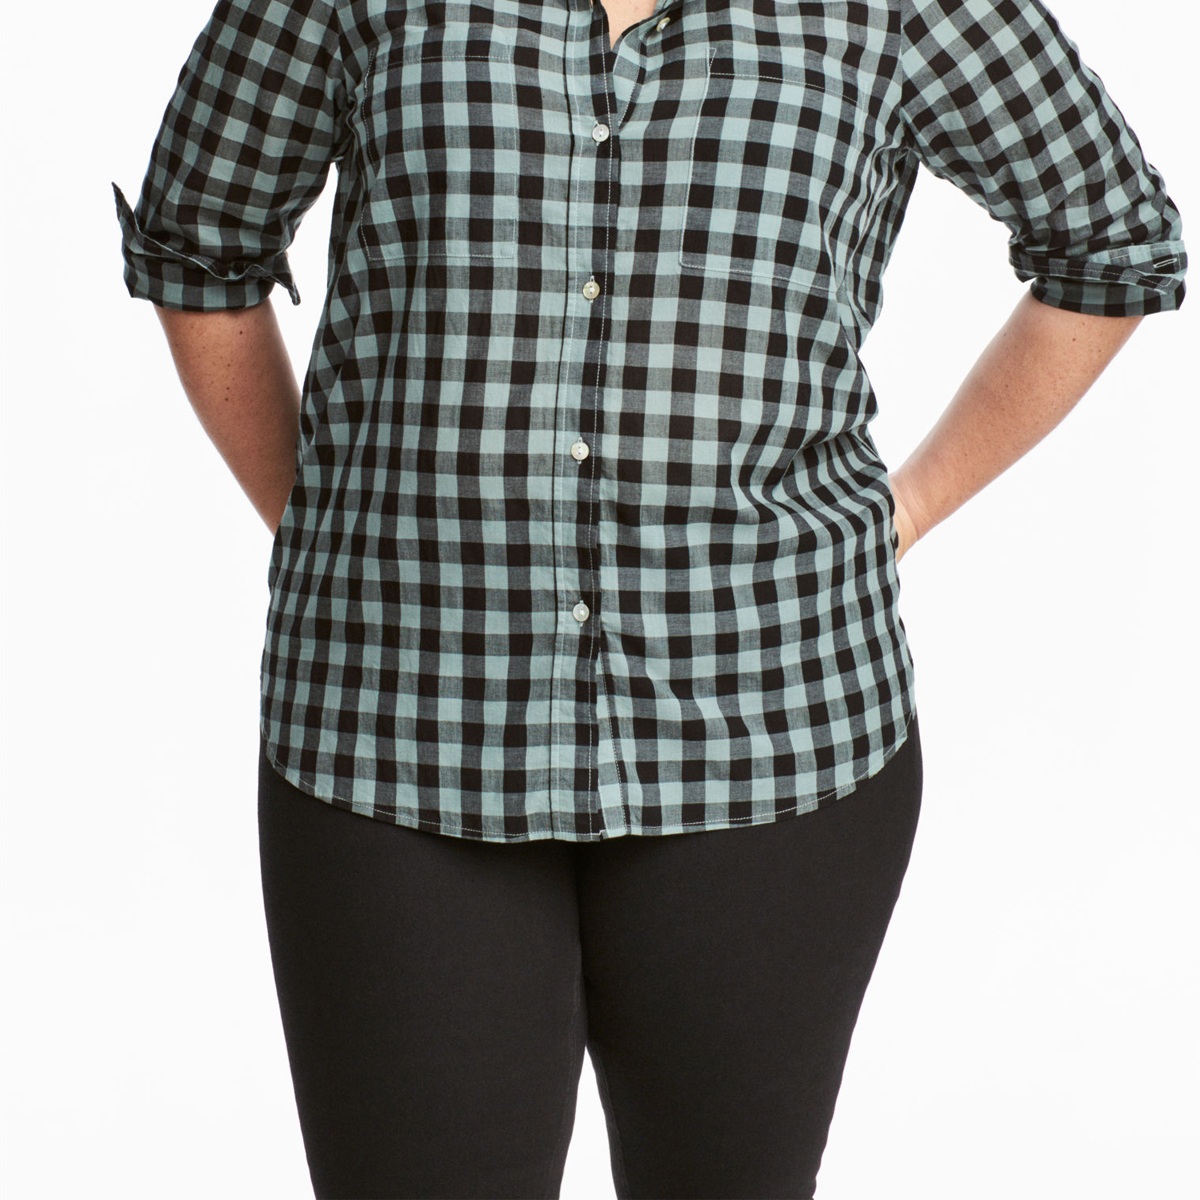 Kissmilk Plus Size Women Button Down Two Pocket Front Shirt Turn Down Collar Plaid Basic Shirt Large Size Casual Loose Shirt 1